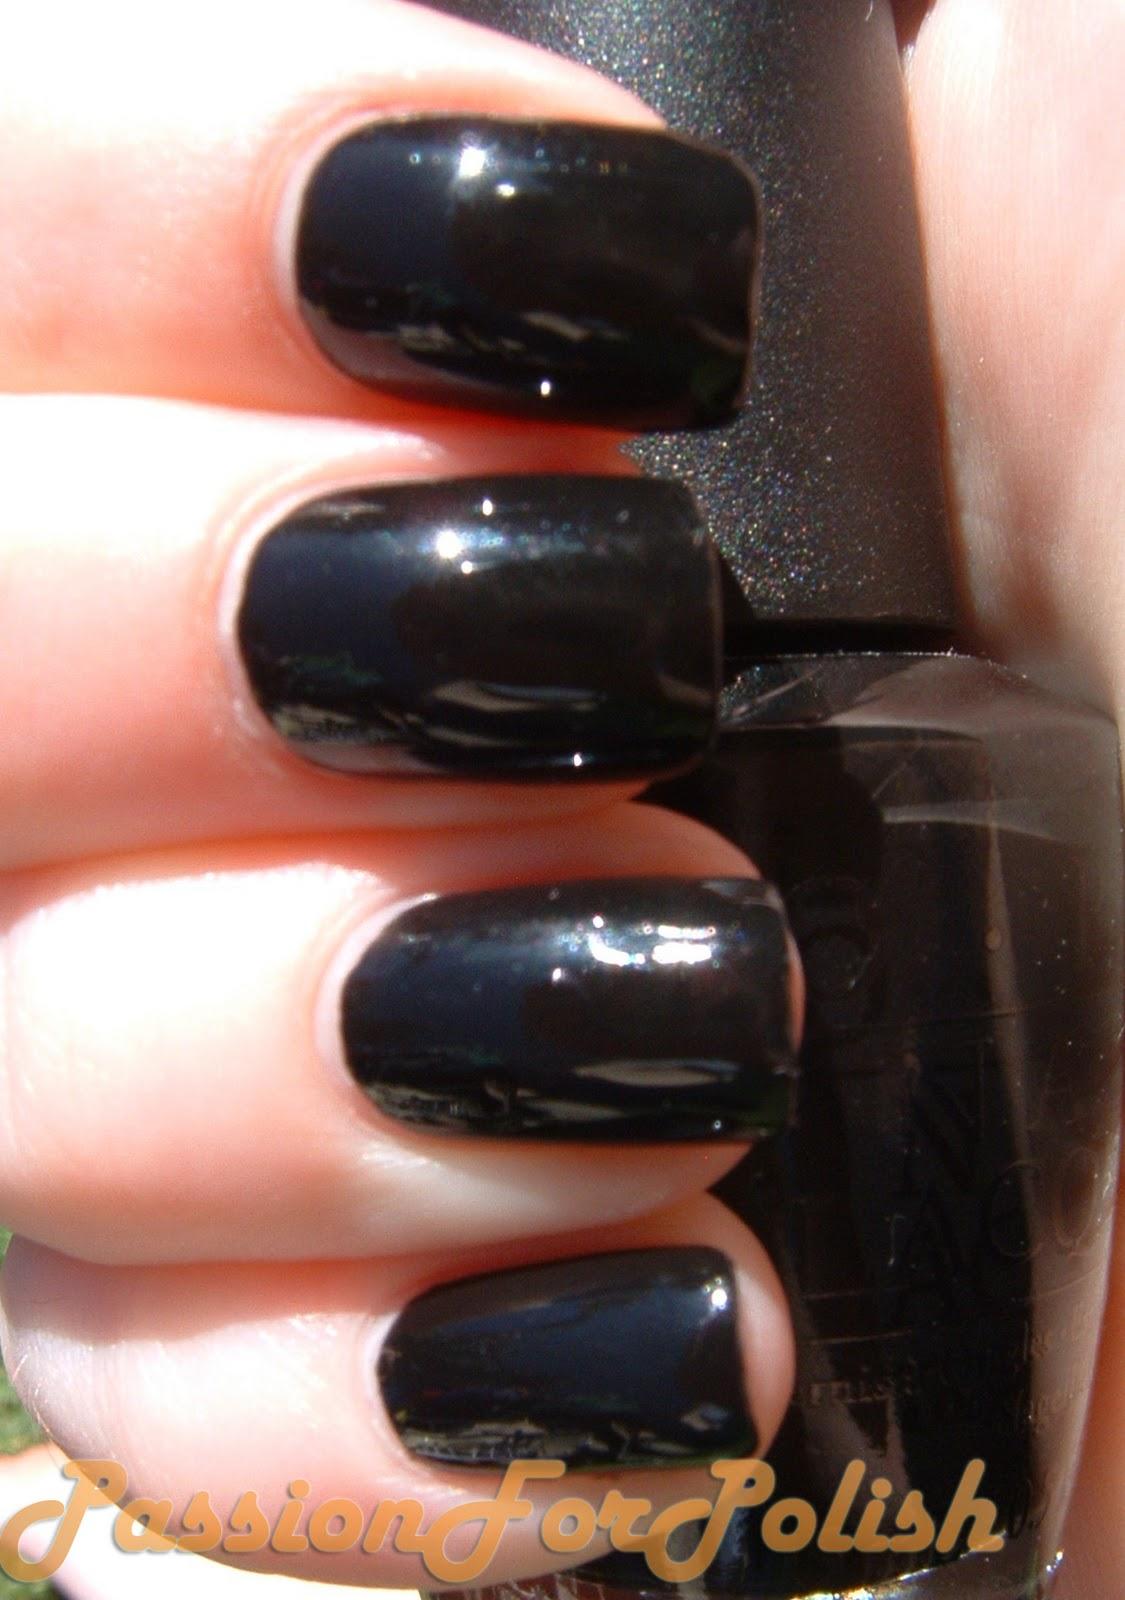 Passionforpolish Opi Black Onyx